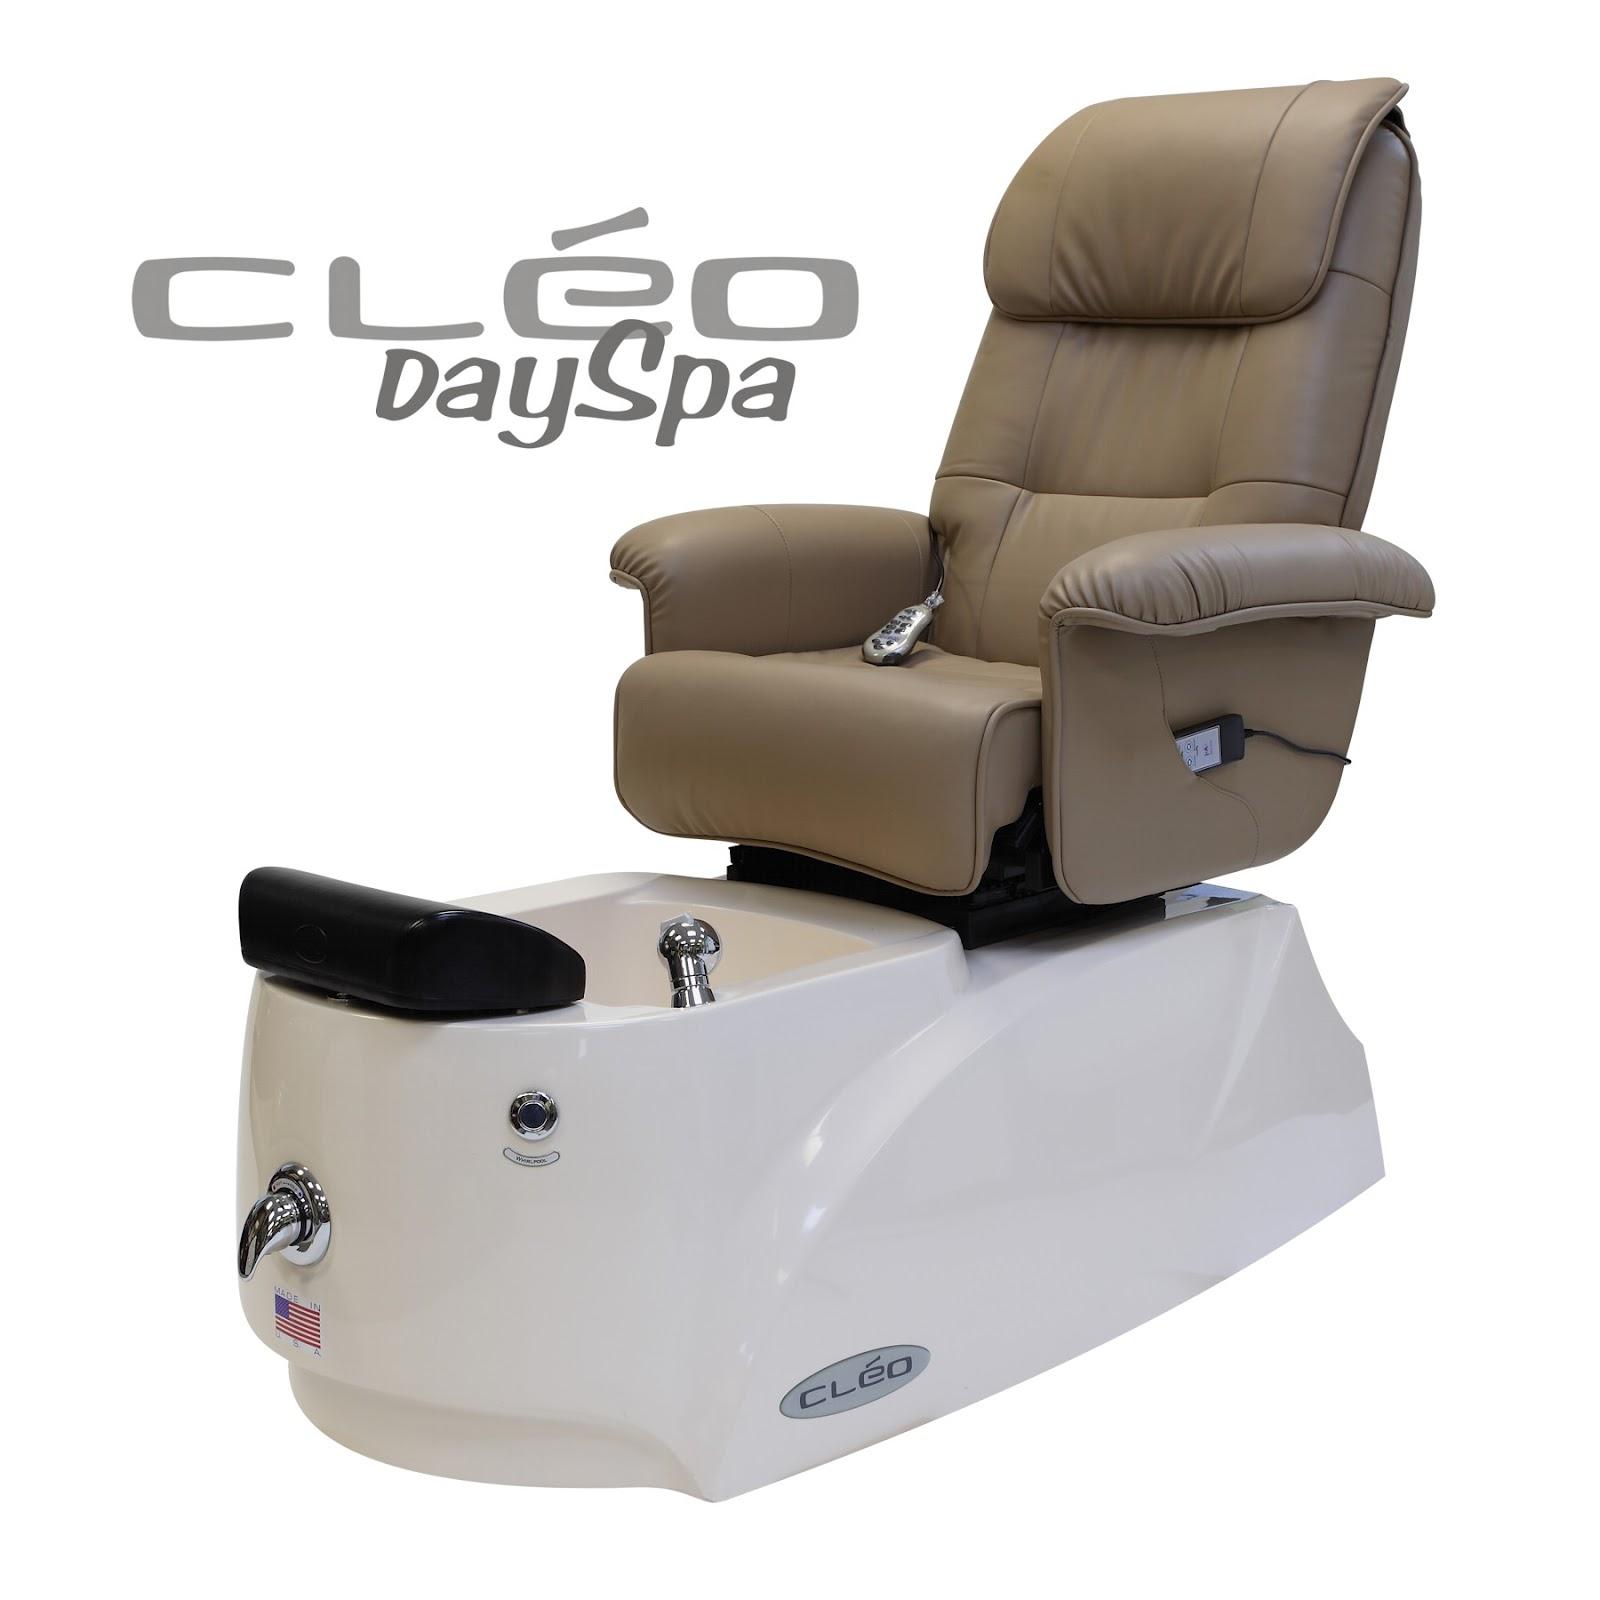 Purchase stylish salon furniture to make your salon more